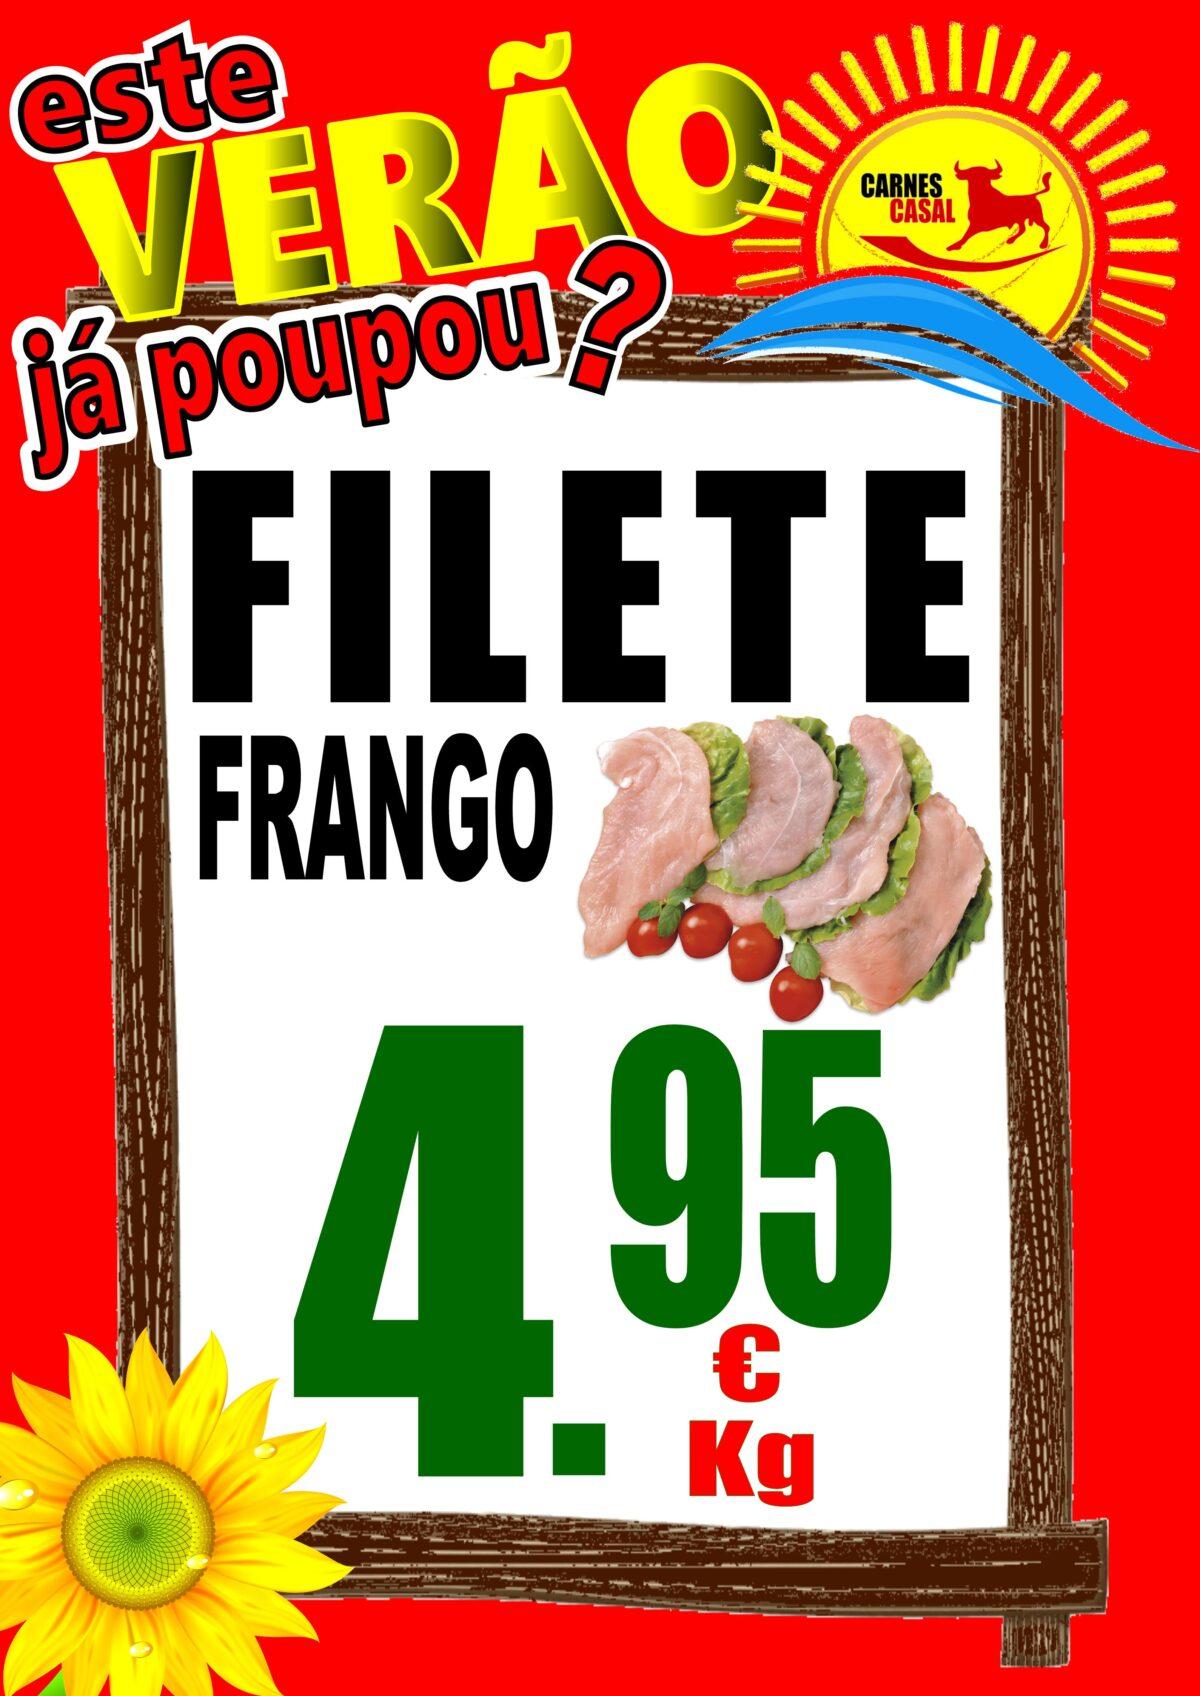 Filete frango